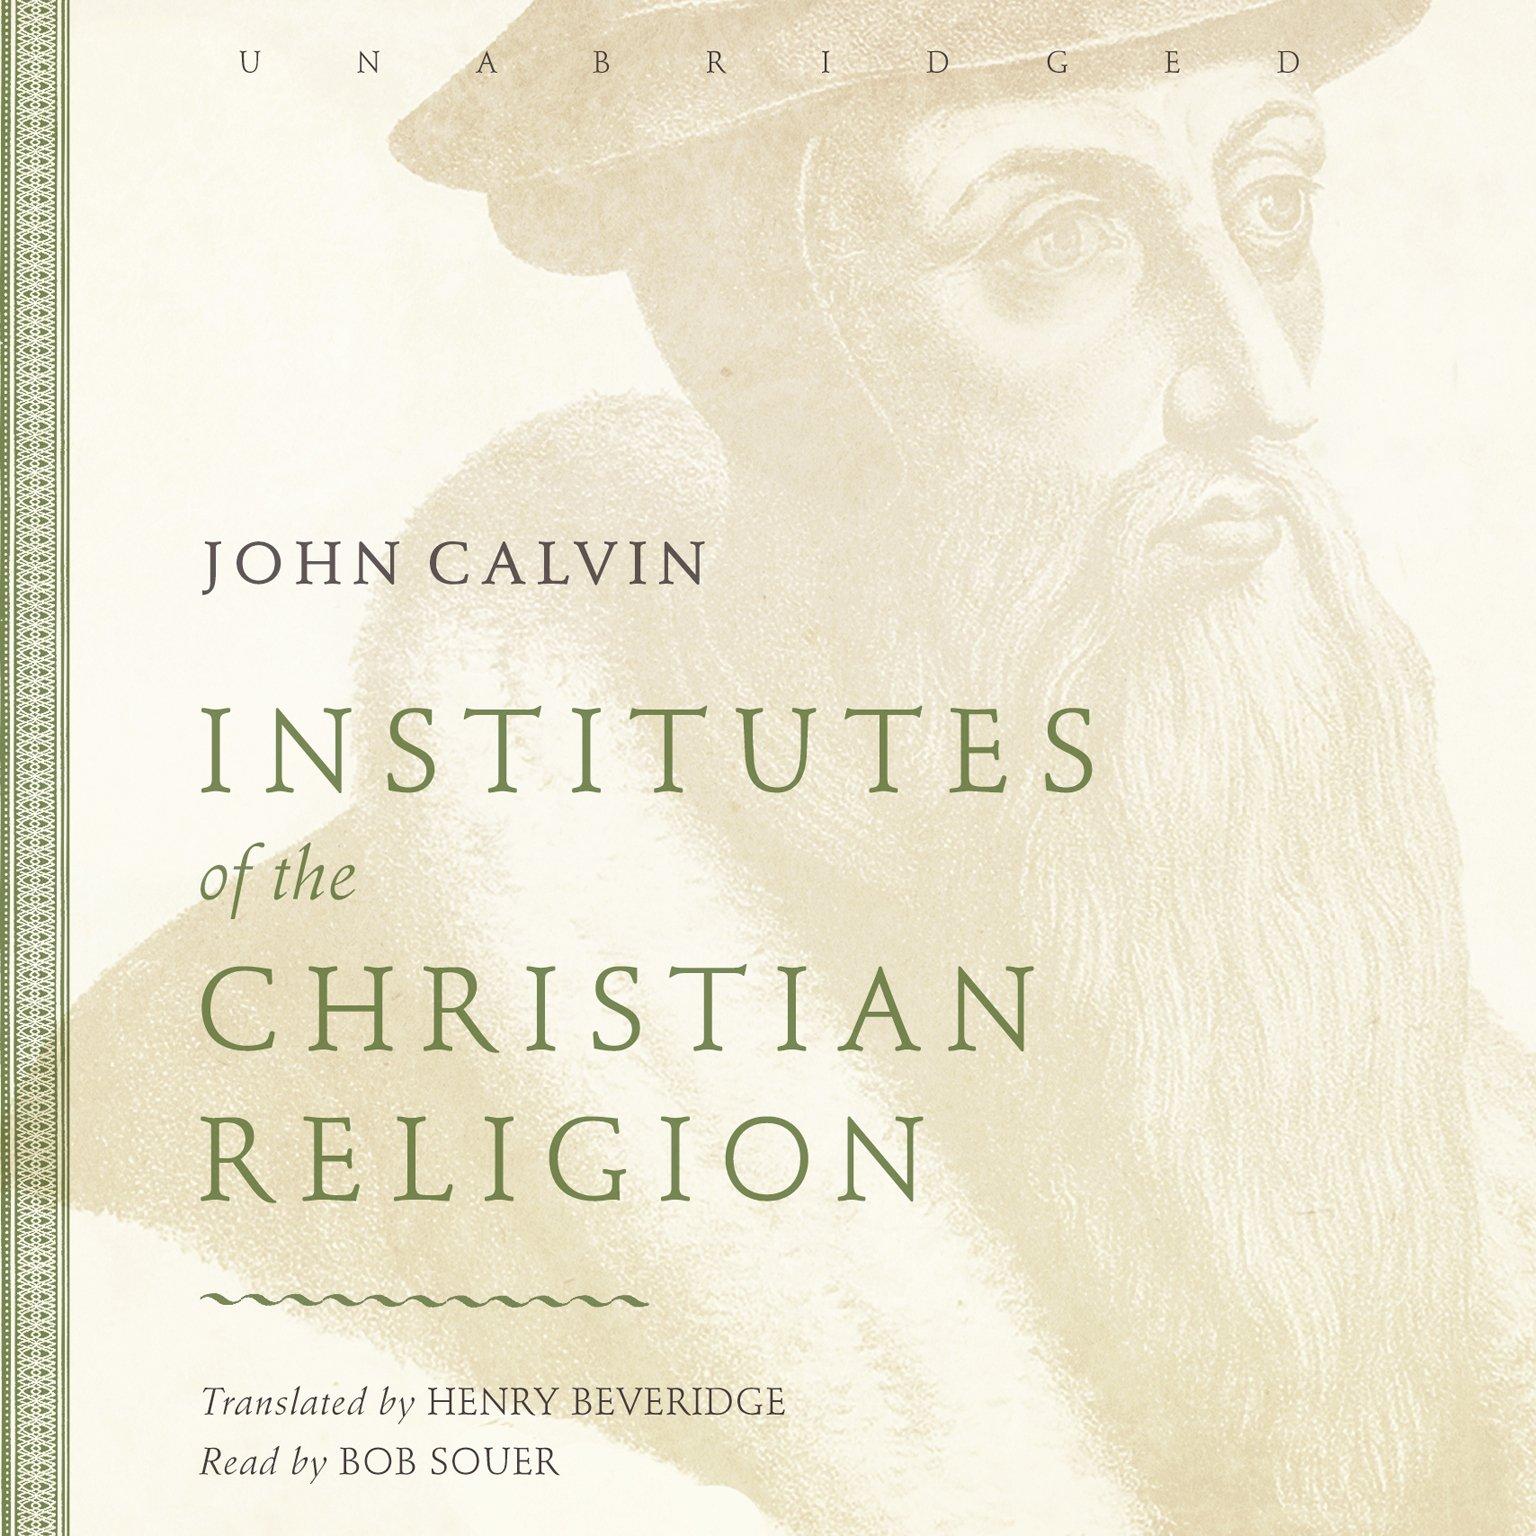 John Calvin - Institutes of the Christian Religion